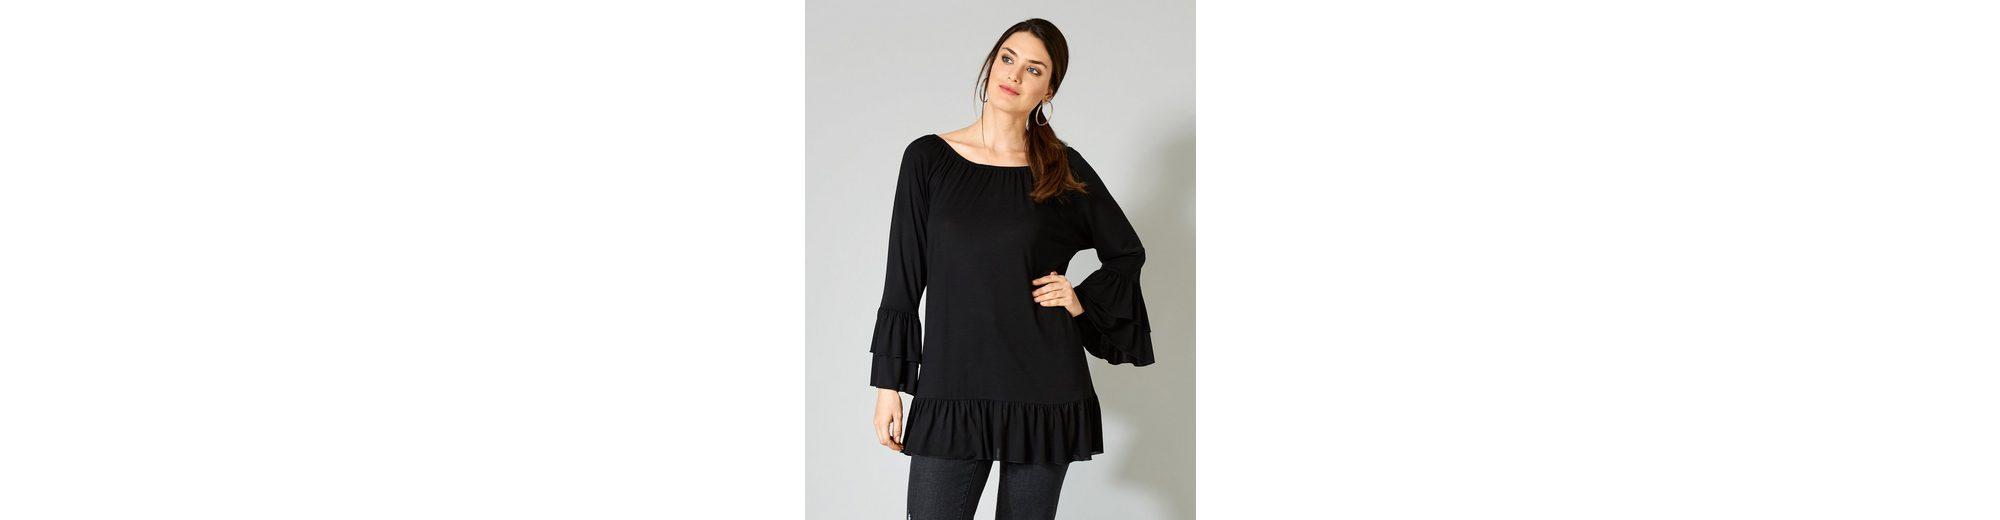 Sara Lindholm by Happy Size Shirt im Carmenstil Original Zum Verkauf e8U94e